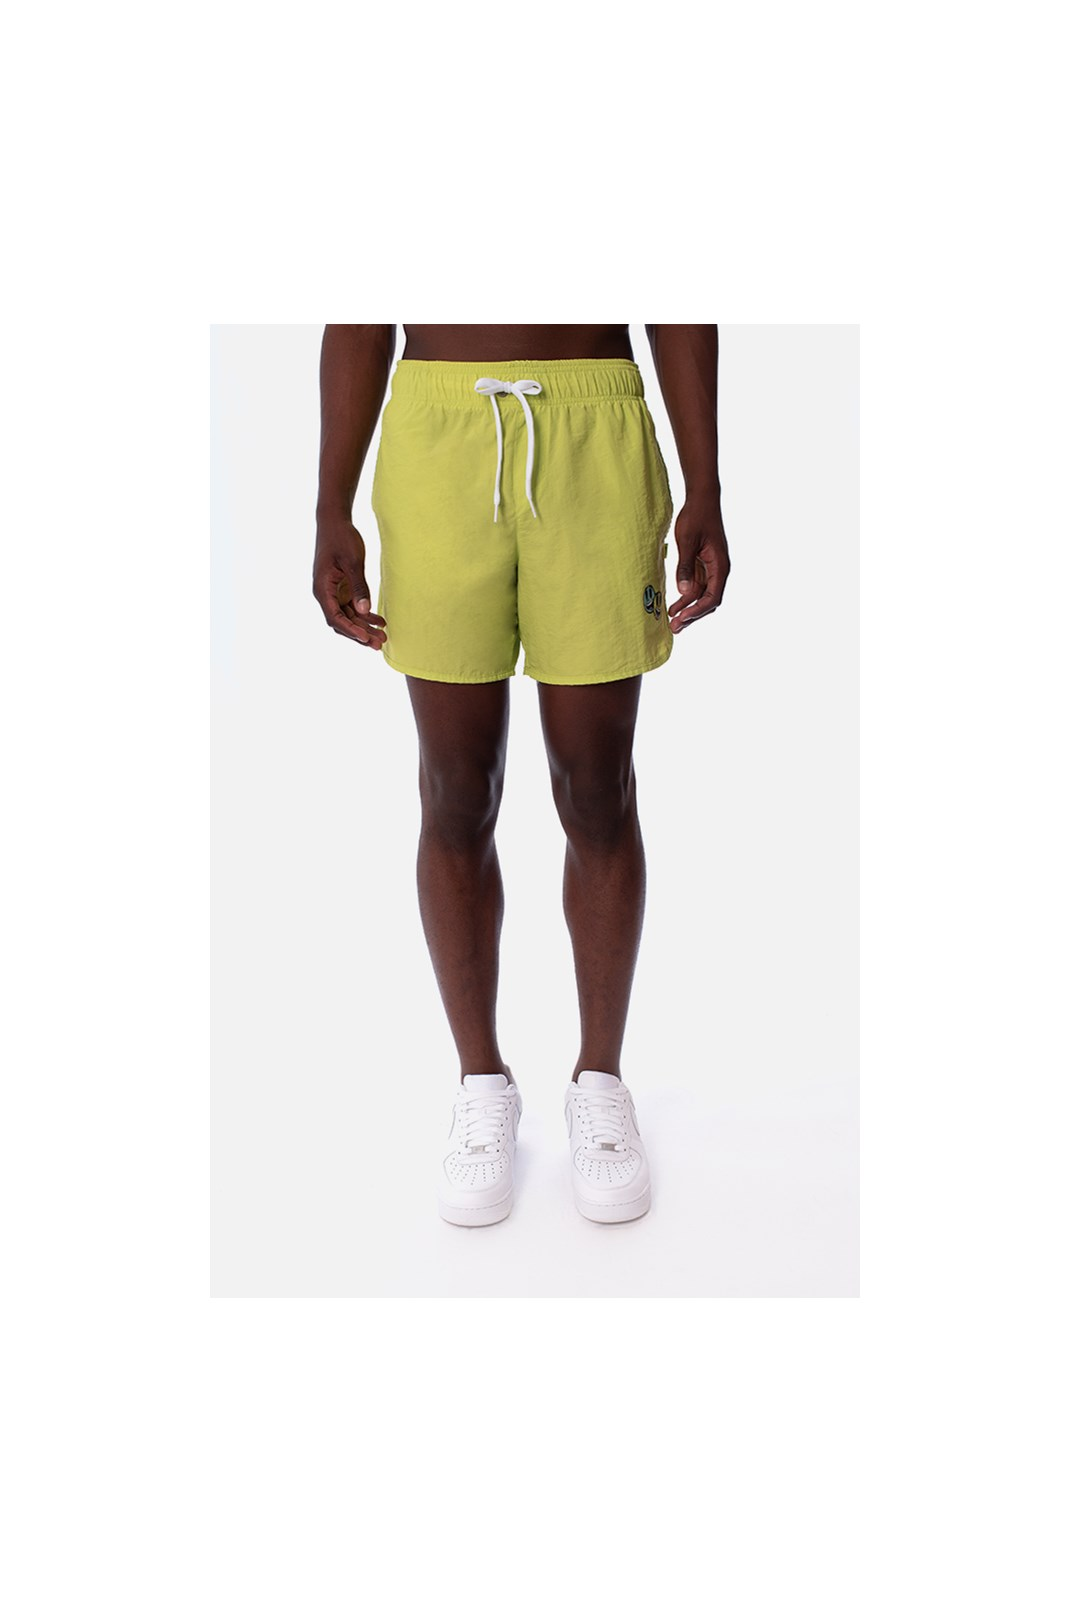 Shorts Approve Cartoon Amarelo Neon